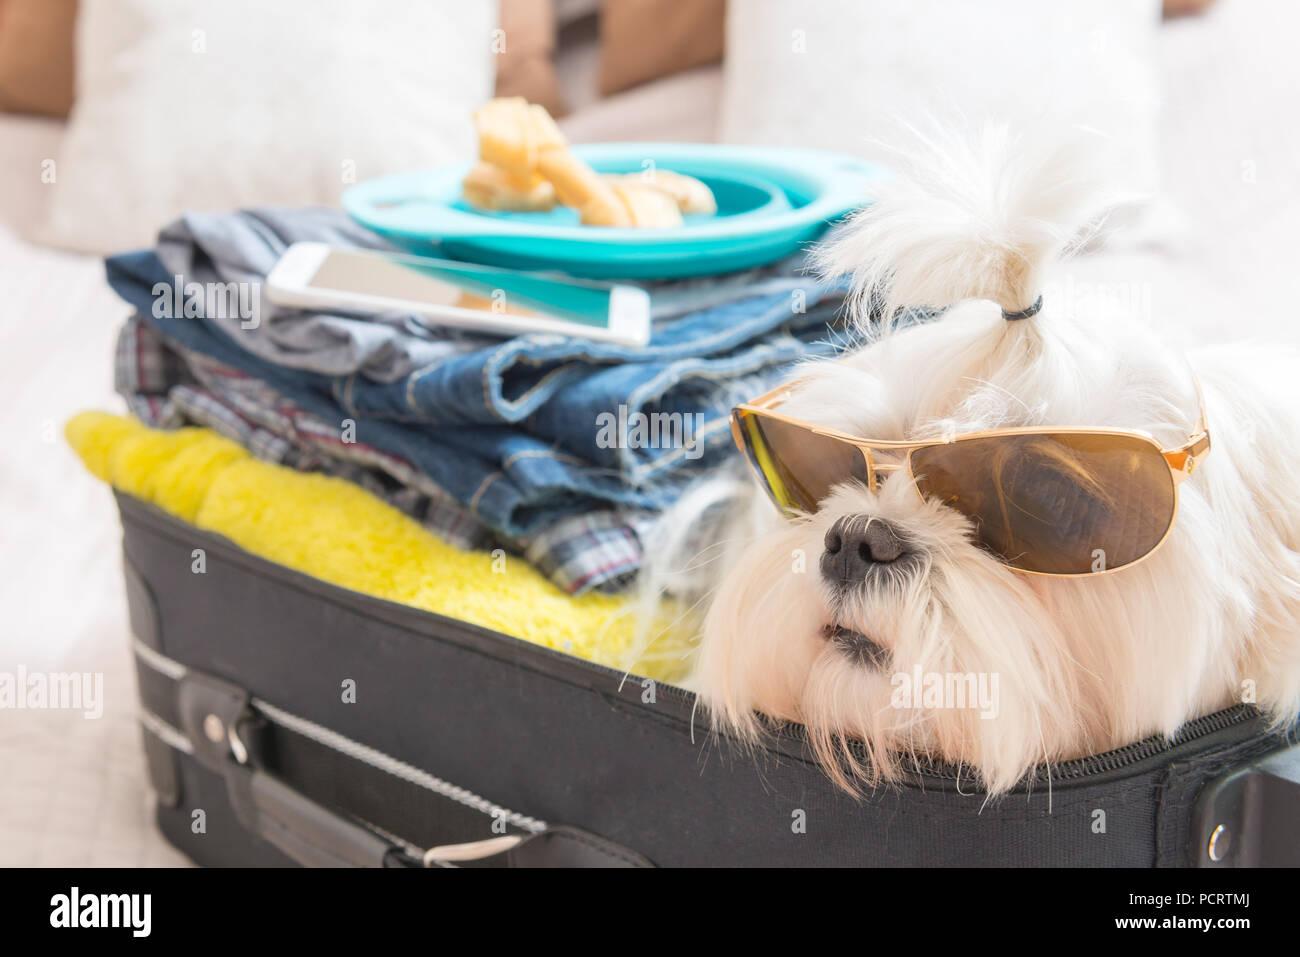 De Imágenes Stockamp; With Sunglasses Maltese OPkn80w